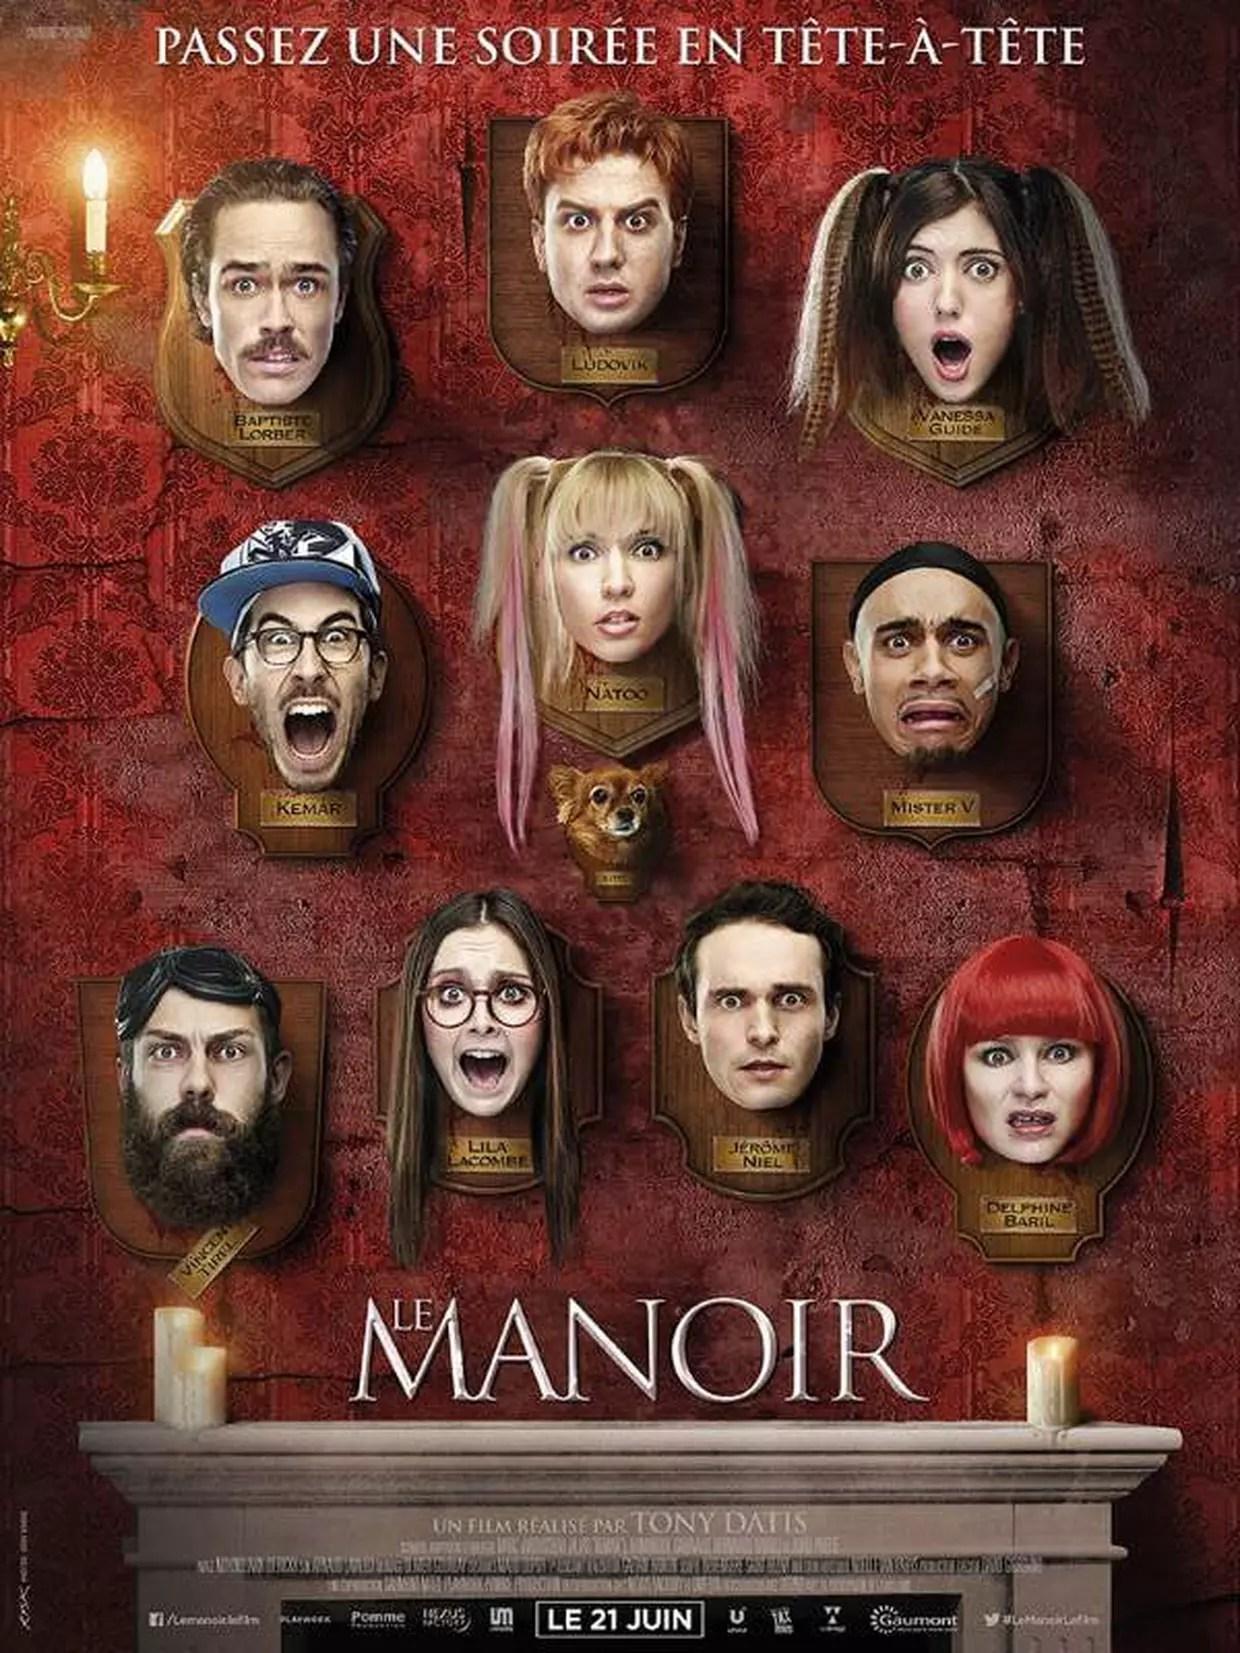 Le Manoir Bande Annonce : manoir, bande, annonce, Manoir, Bande, Annonce, Film,, Séances,, Streaming,, Sortie,